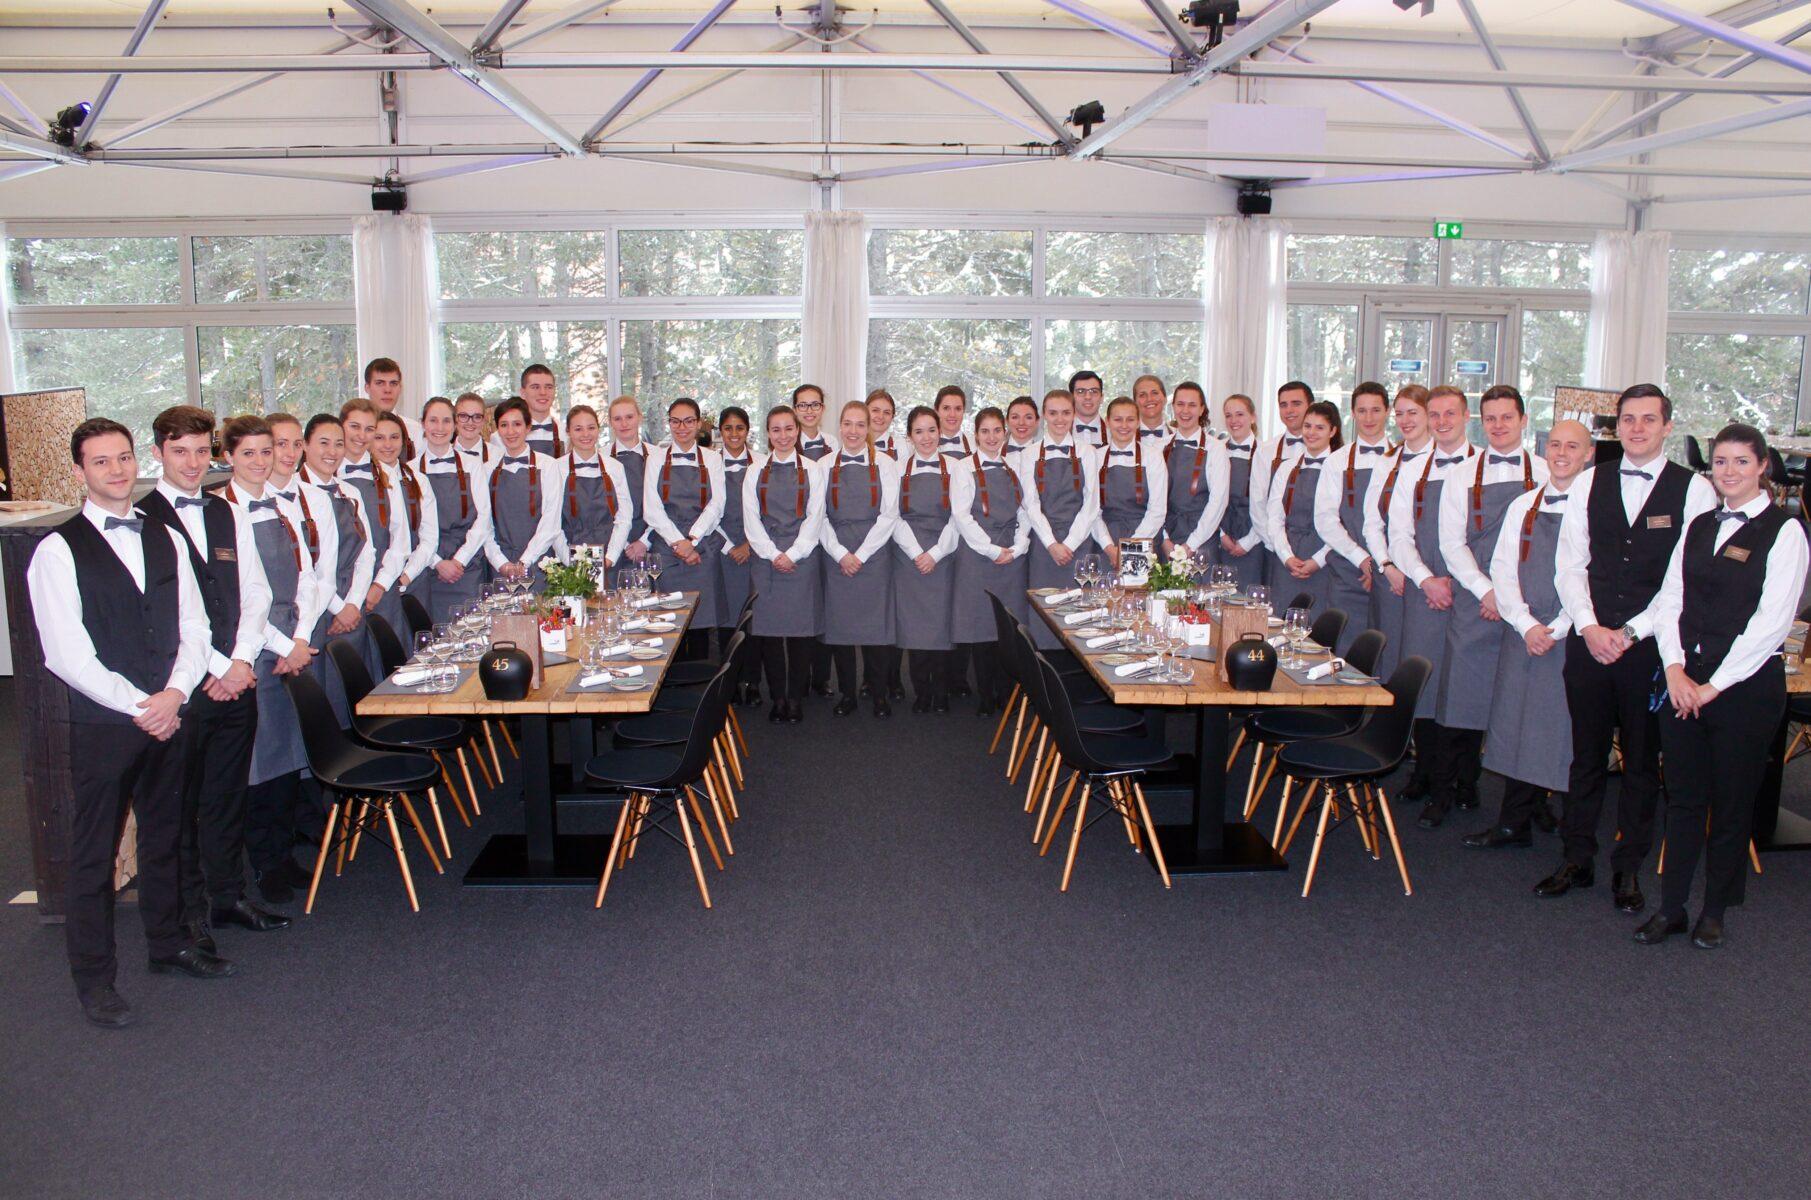 26.-31.12. - Spengler Cup Davos - Vaillant Arena GR